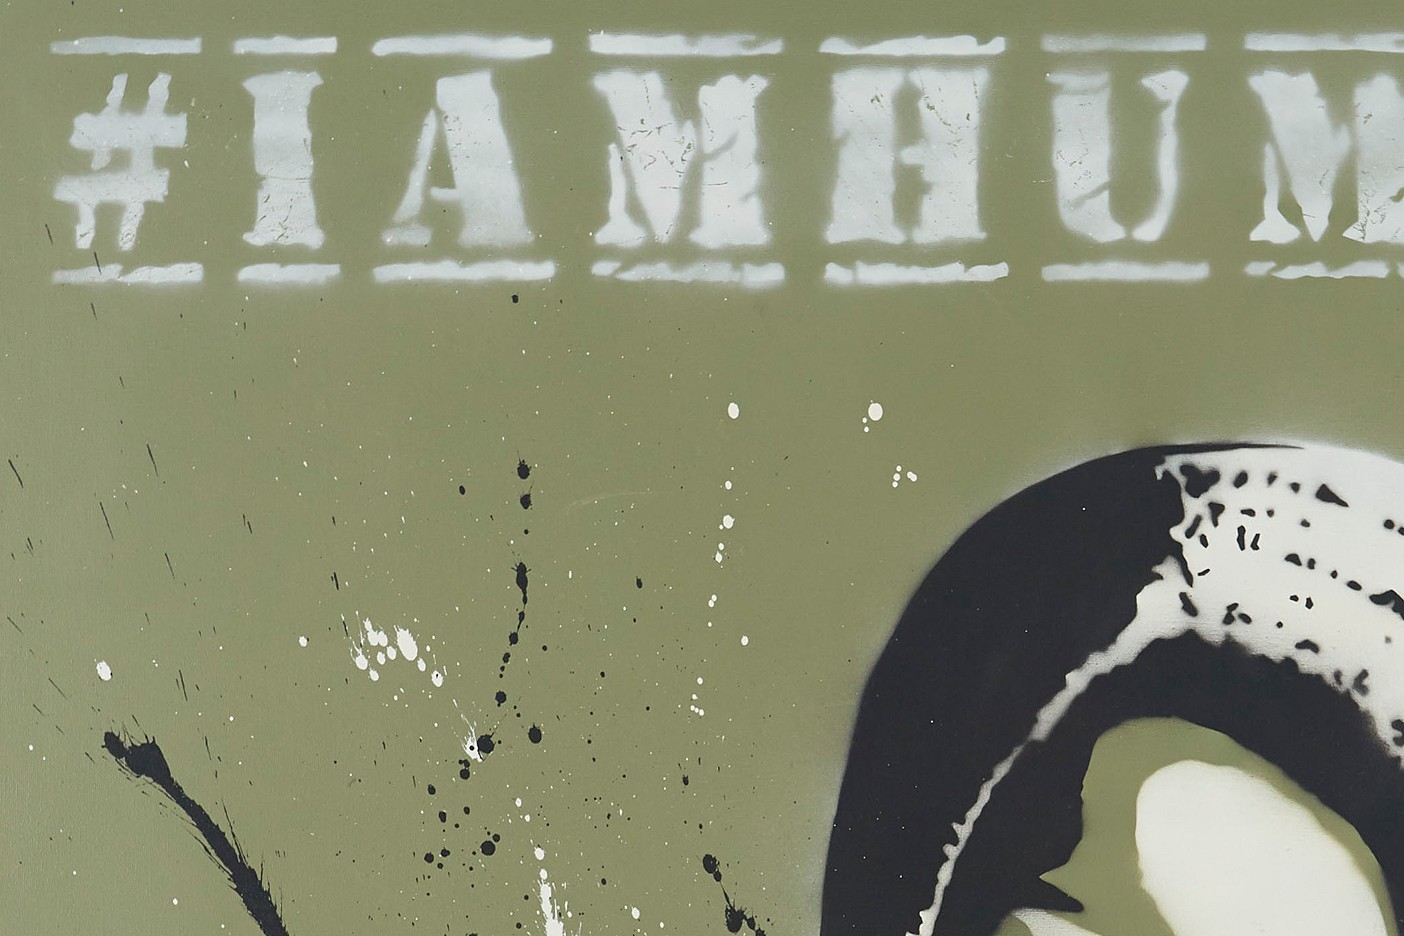 #iamhuman - my name is saida